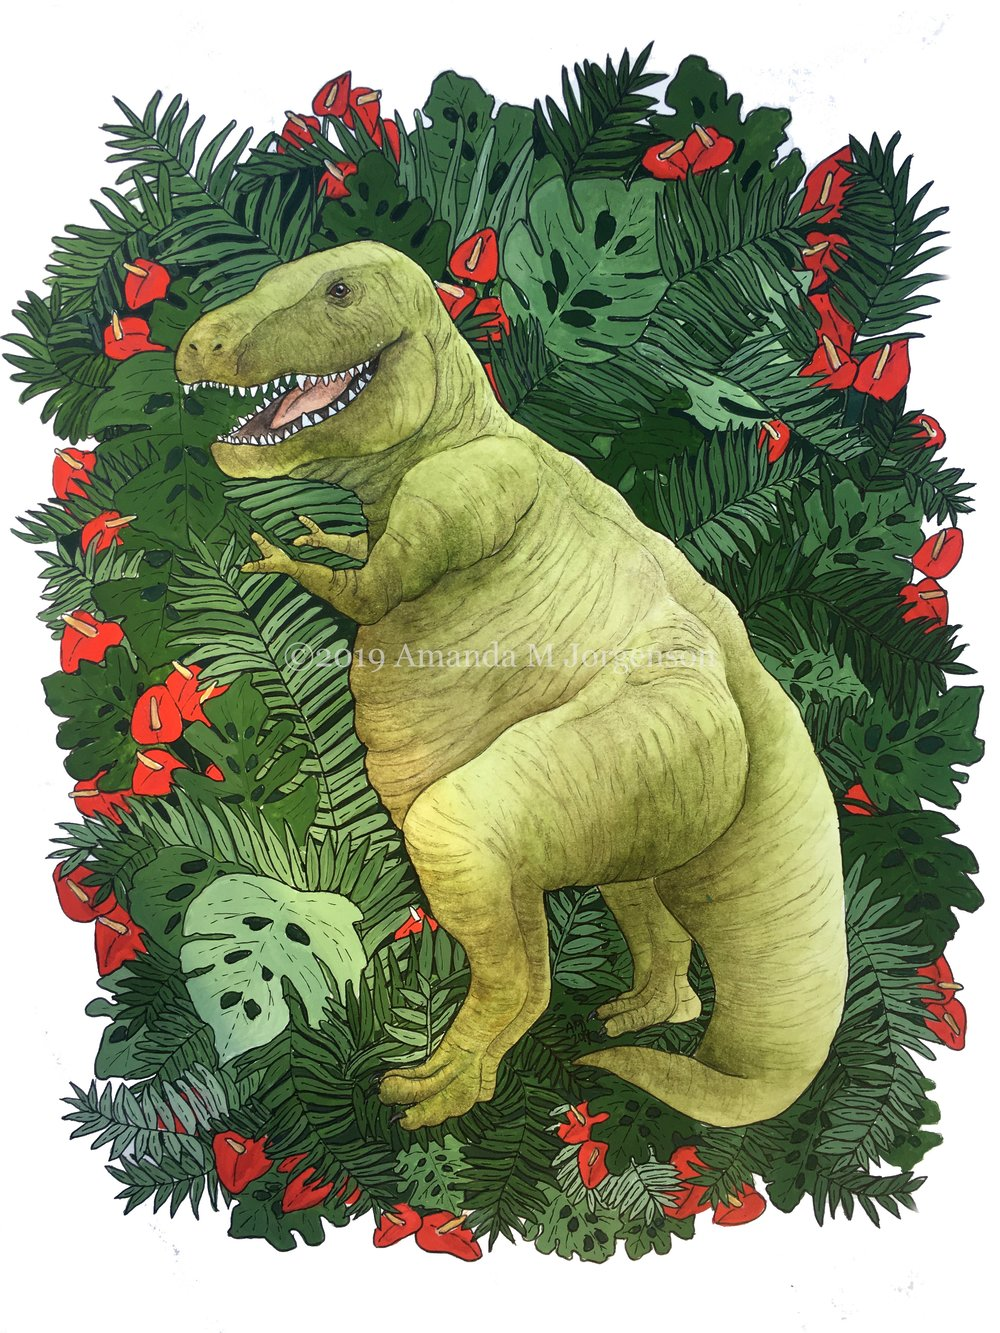 Tubby T.Rex